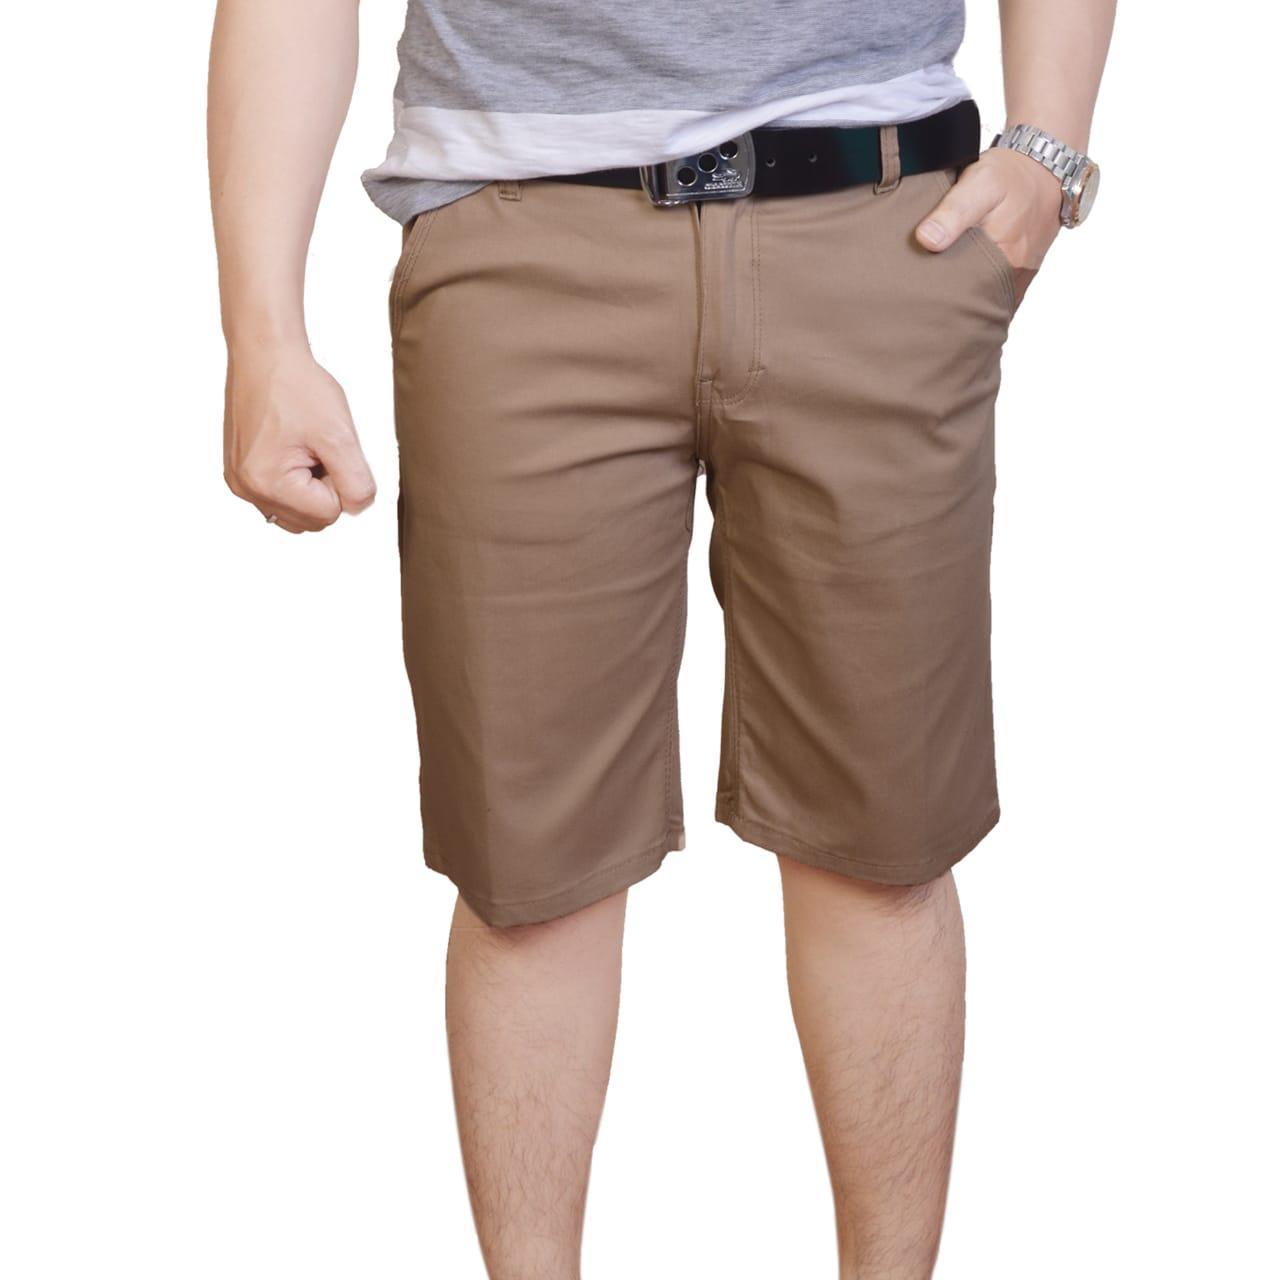 Celana Pendek Pria - Celana Pendek Chino - Celana Pendek Cargo Fashion  Pakaian Pria Jahitan Rapi bb5506e5da